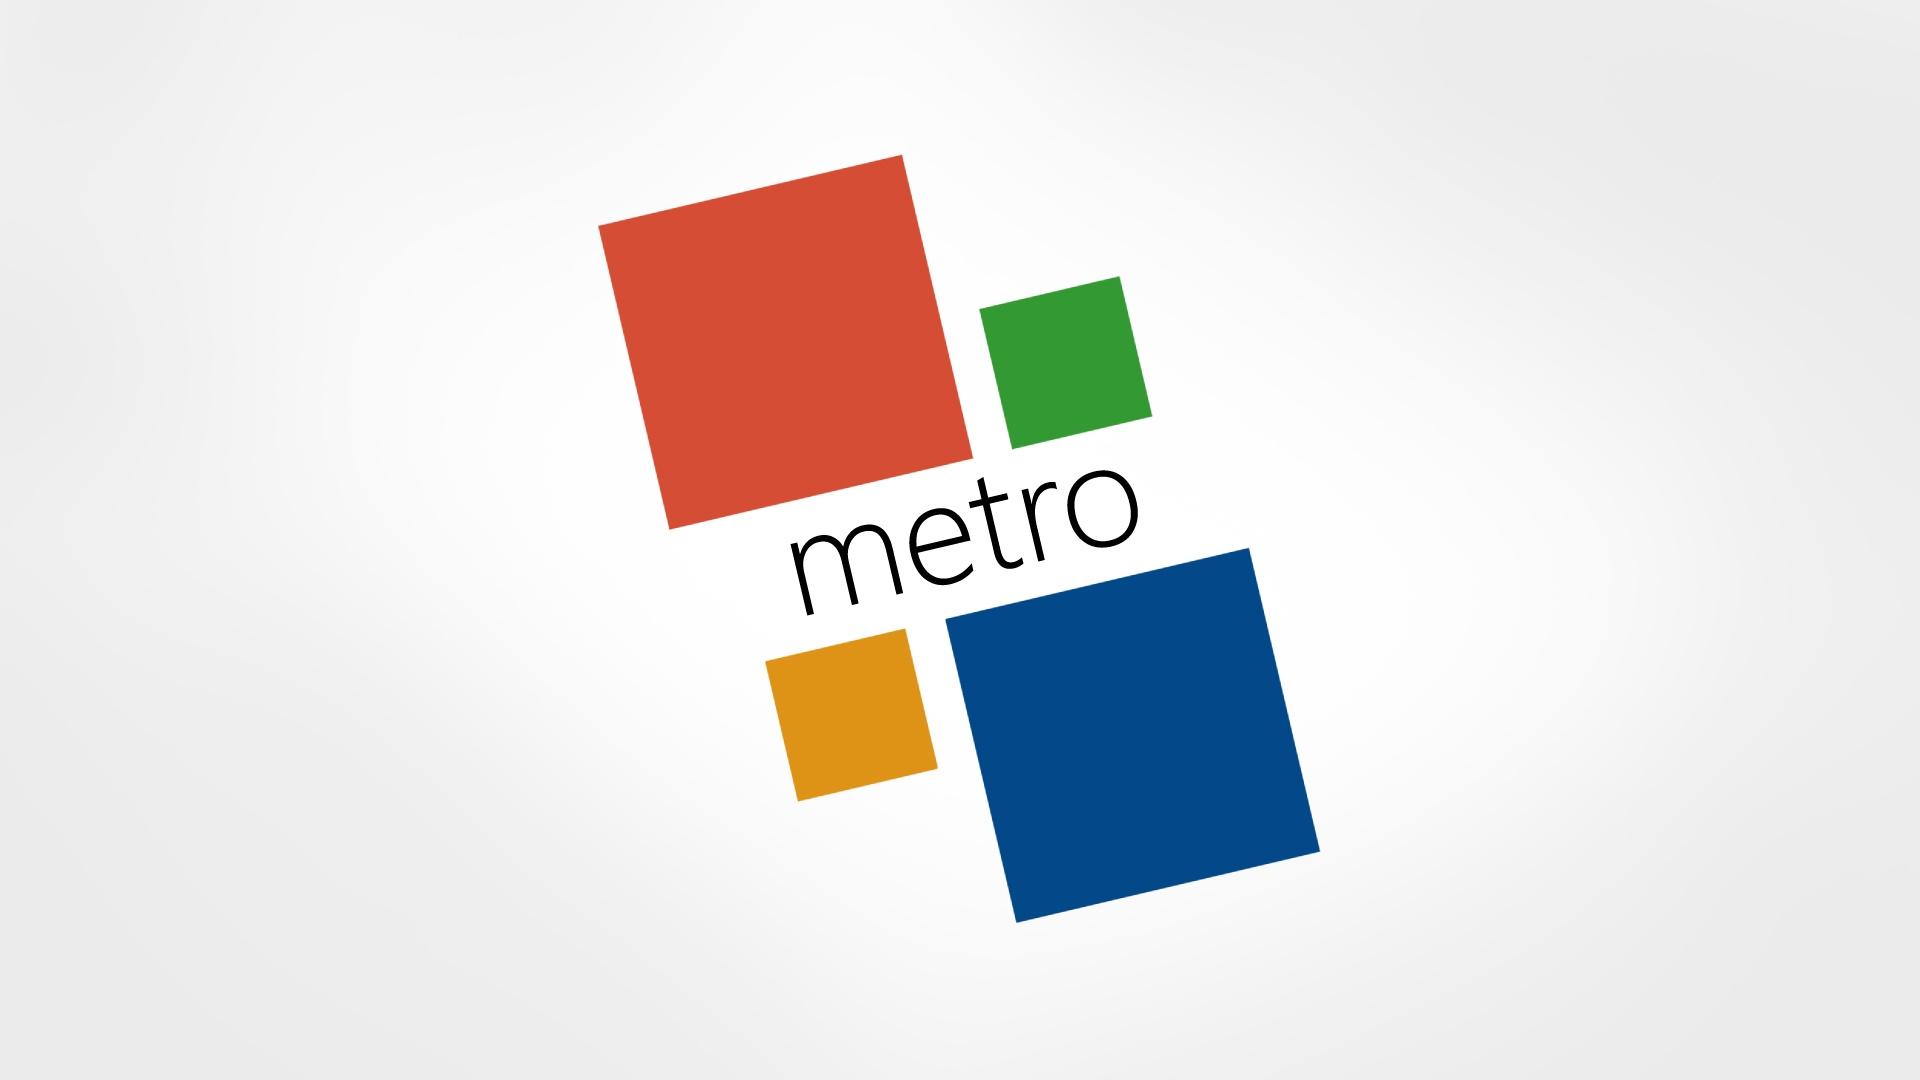 Download Windows 8 Background Windows 8 Metro Minimal Wallpaper x 1920x1080